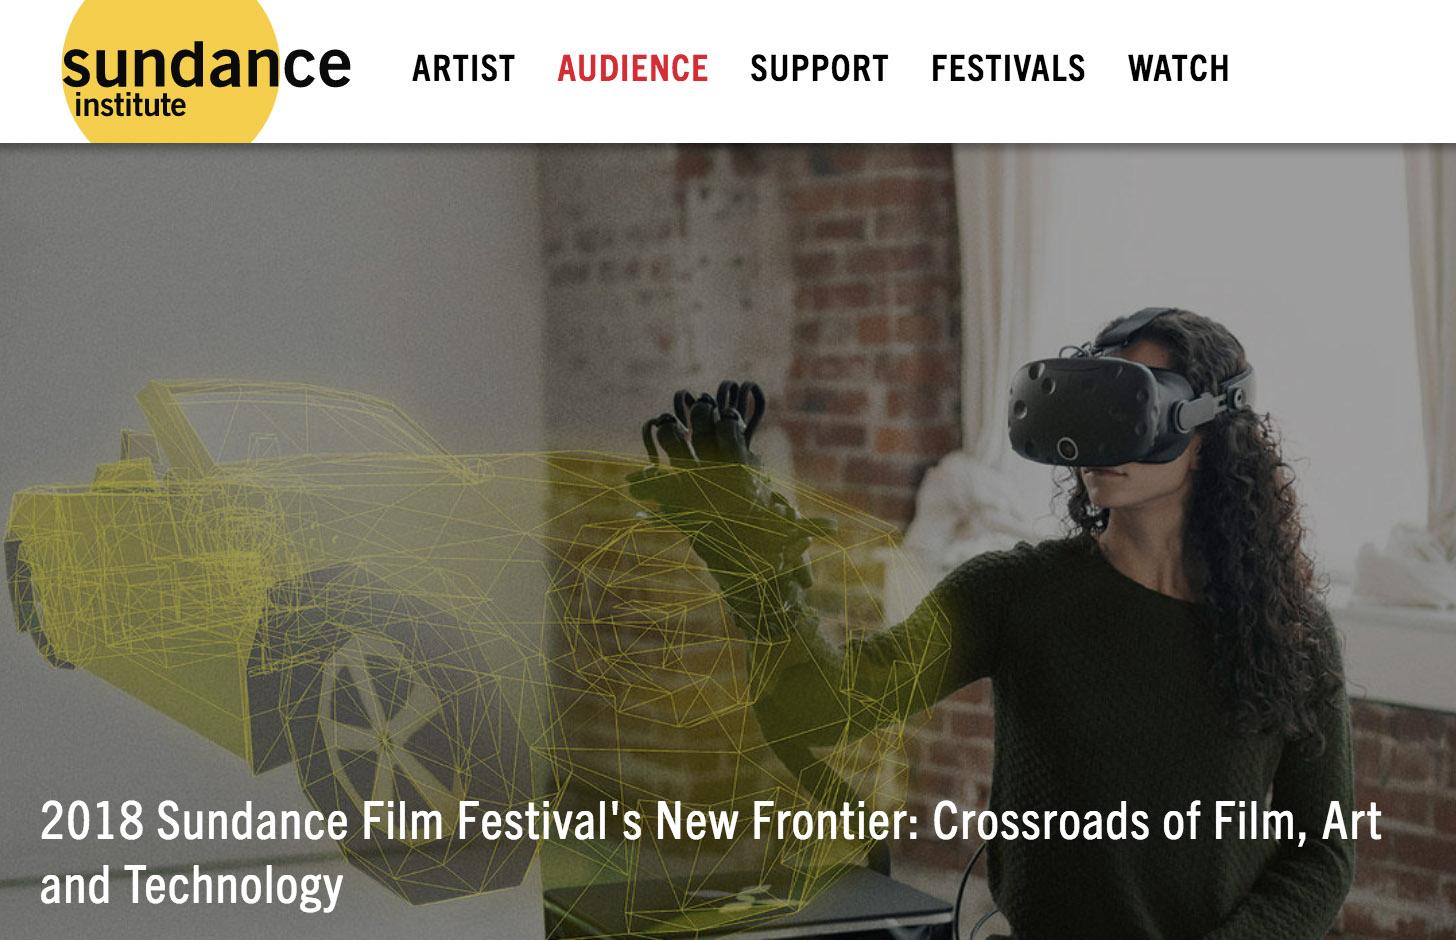 Sundance+Festival+Home+Page.jpg